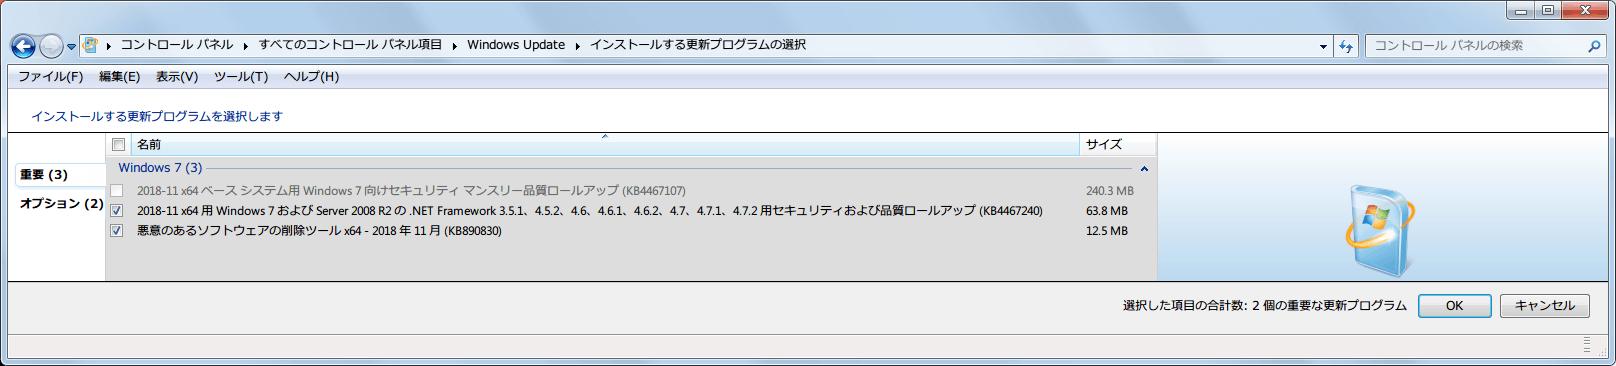 Windows 7 64bit Windows Update 重要 2018年11月分リスト KB4467107 非表示